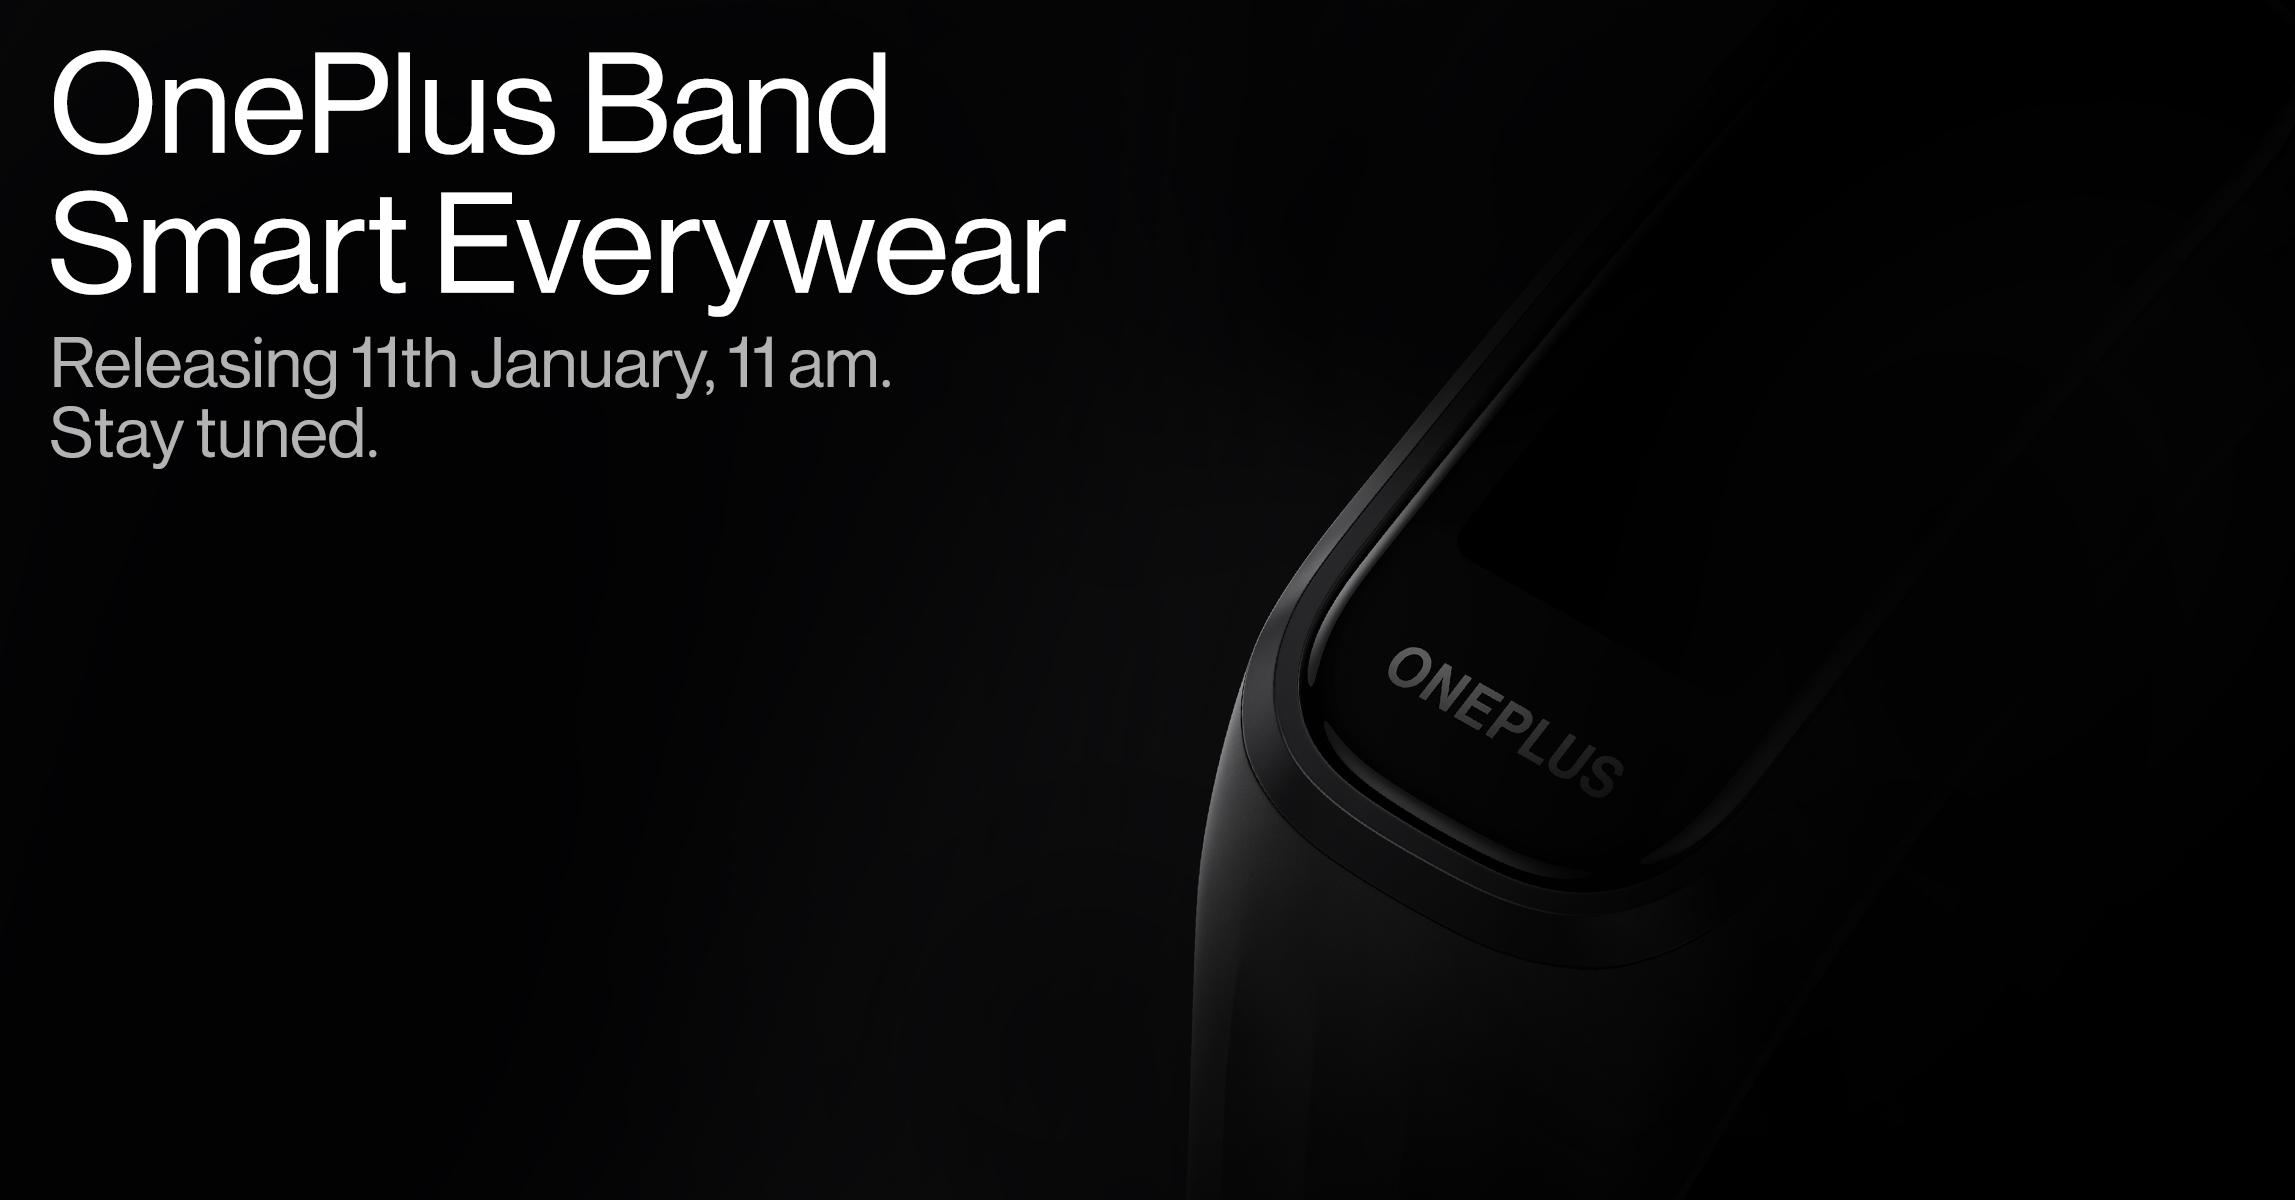 Презентация фитнес-браслета OnePlus Band